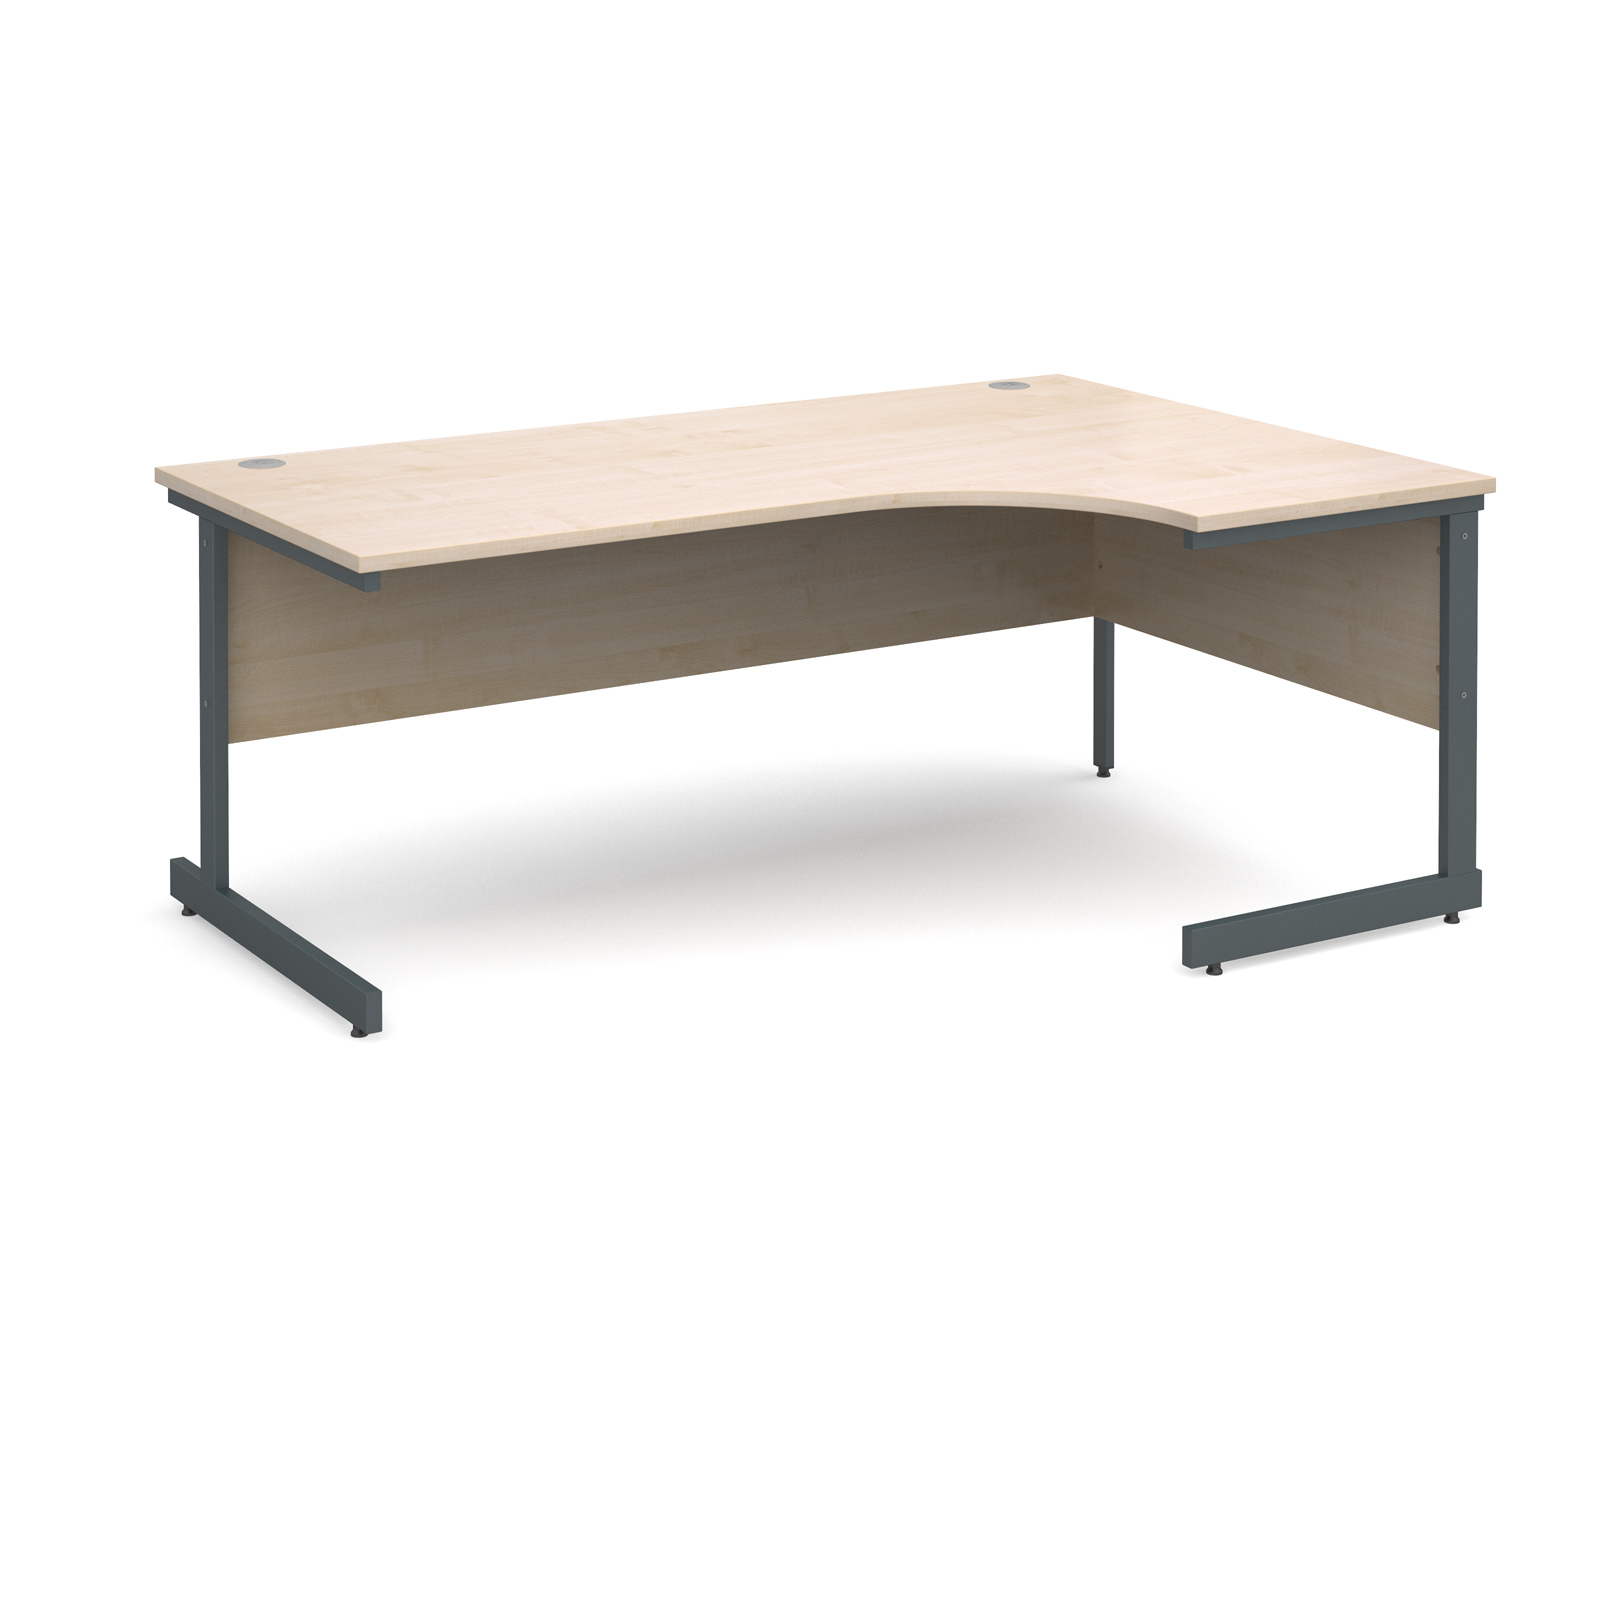 Contract 25 right hand ergonomic desk 1800mm - graphite cantilever frame, maple top